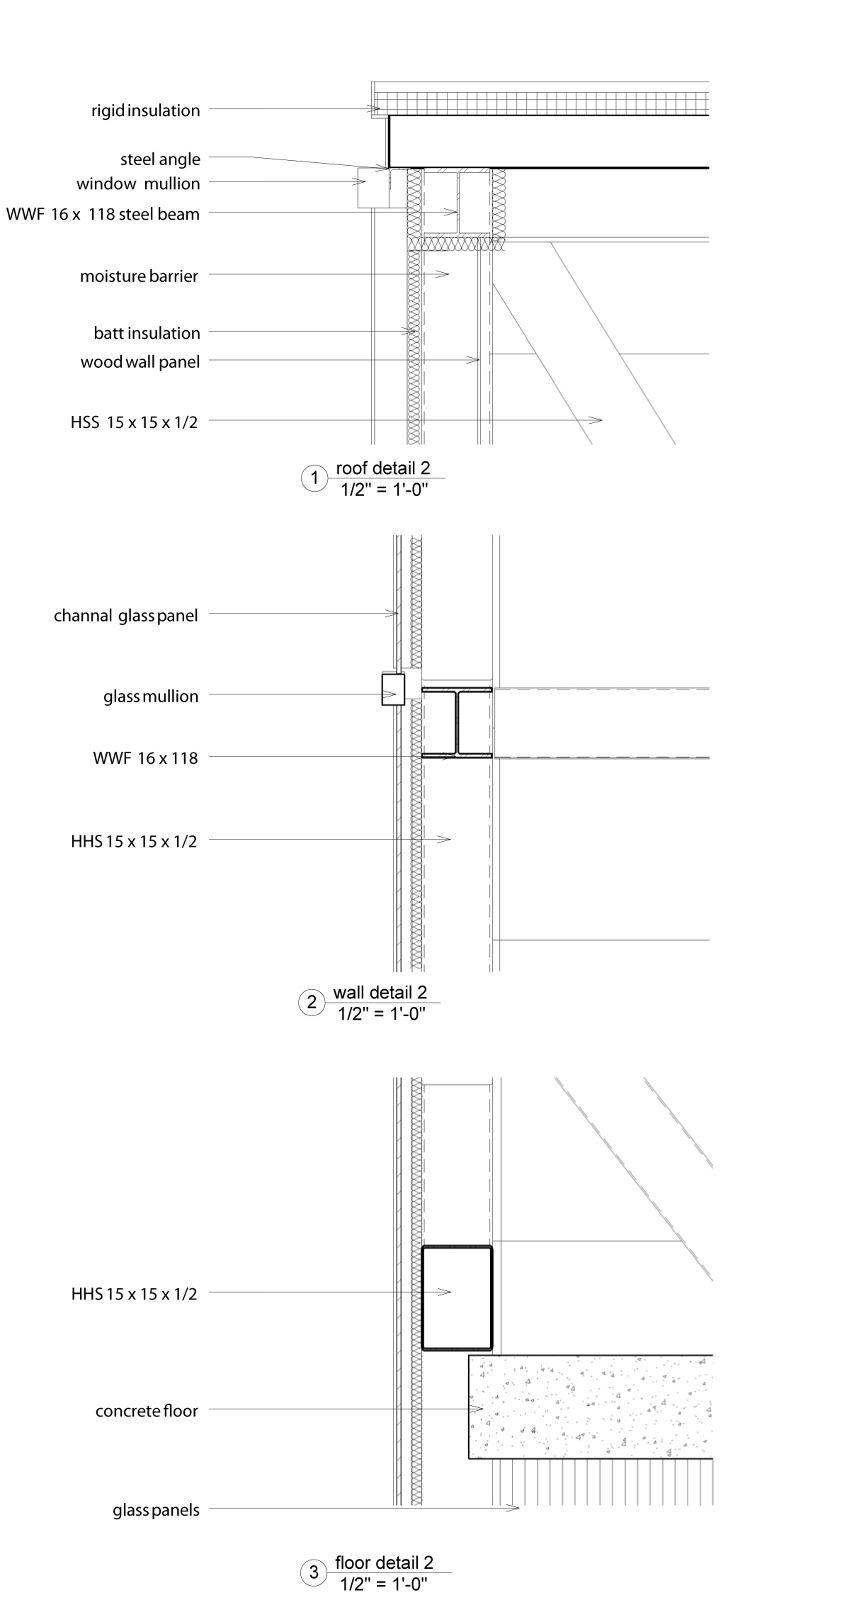 Bim Modeling Liz Lessig Roof Detail Batt Insulation Bim Model